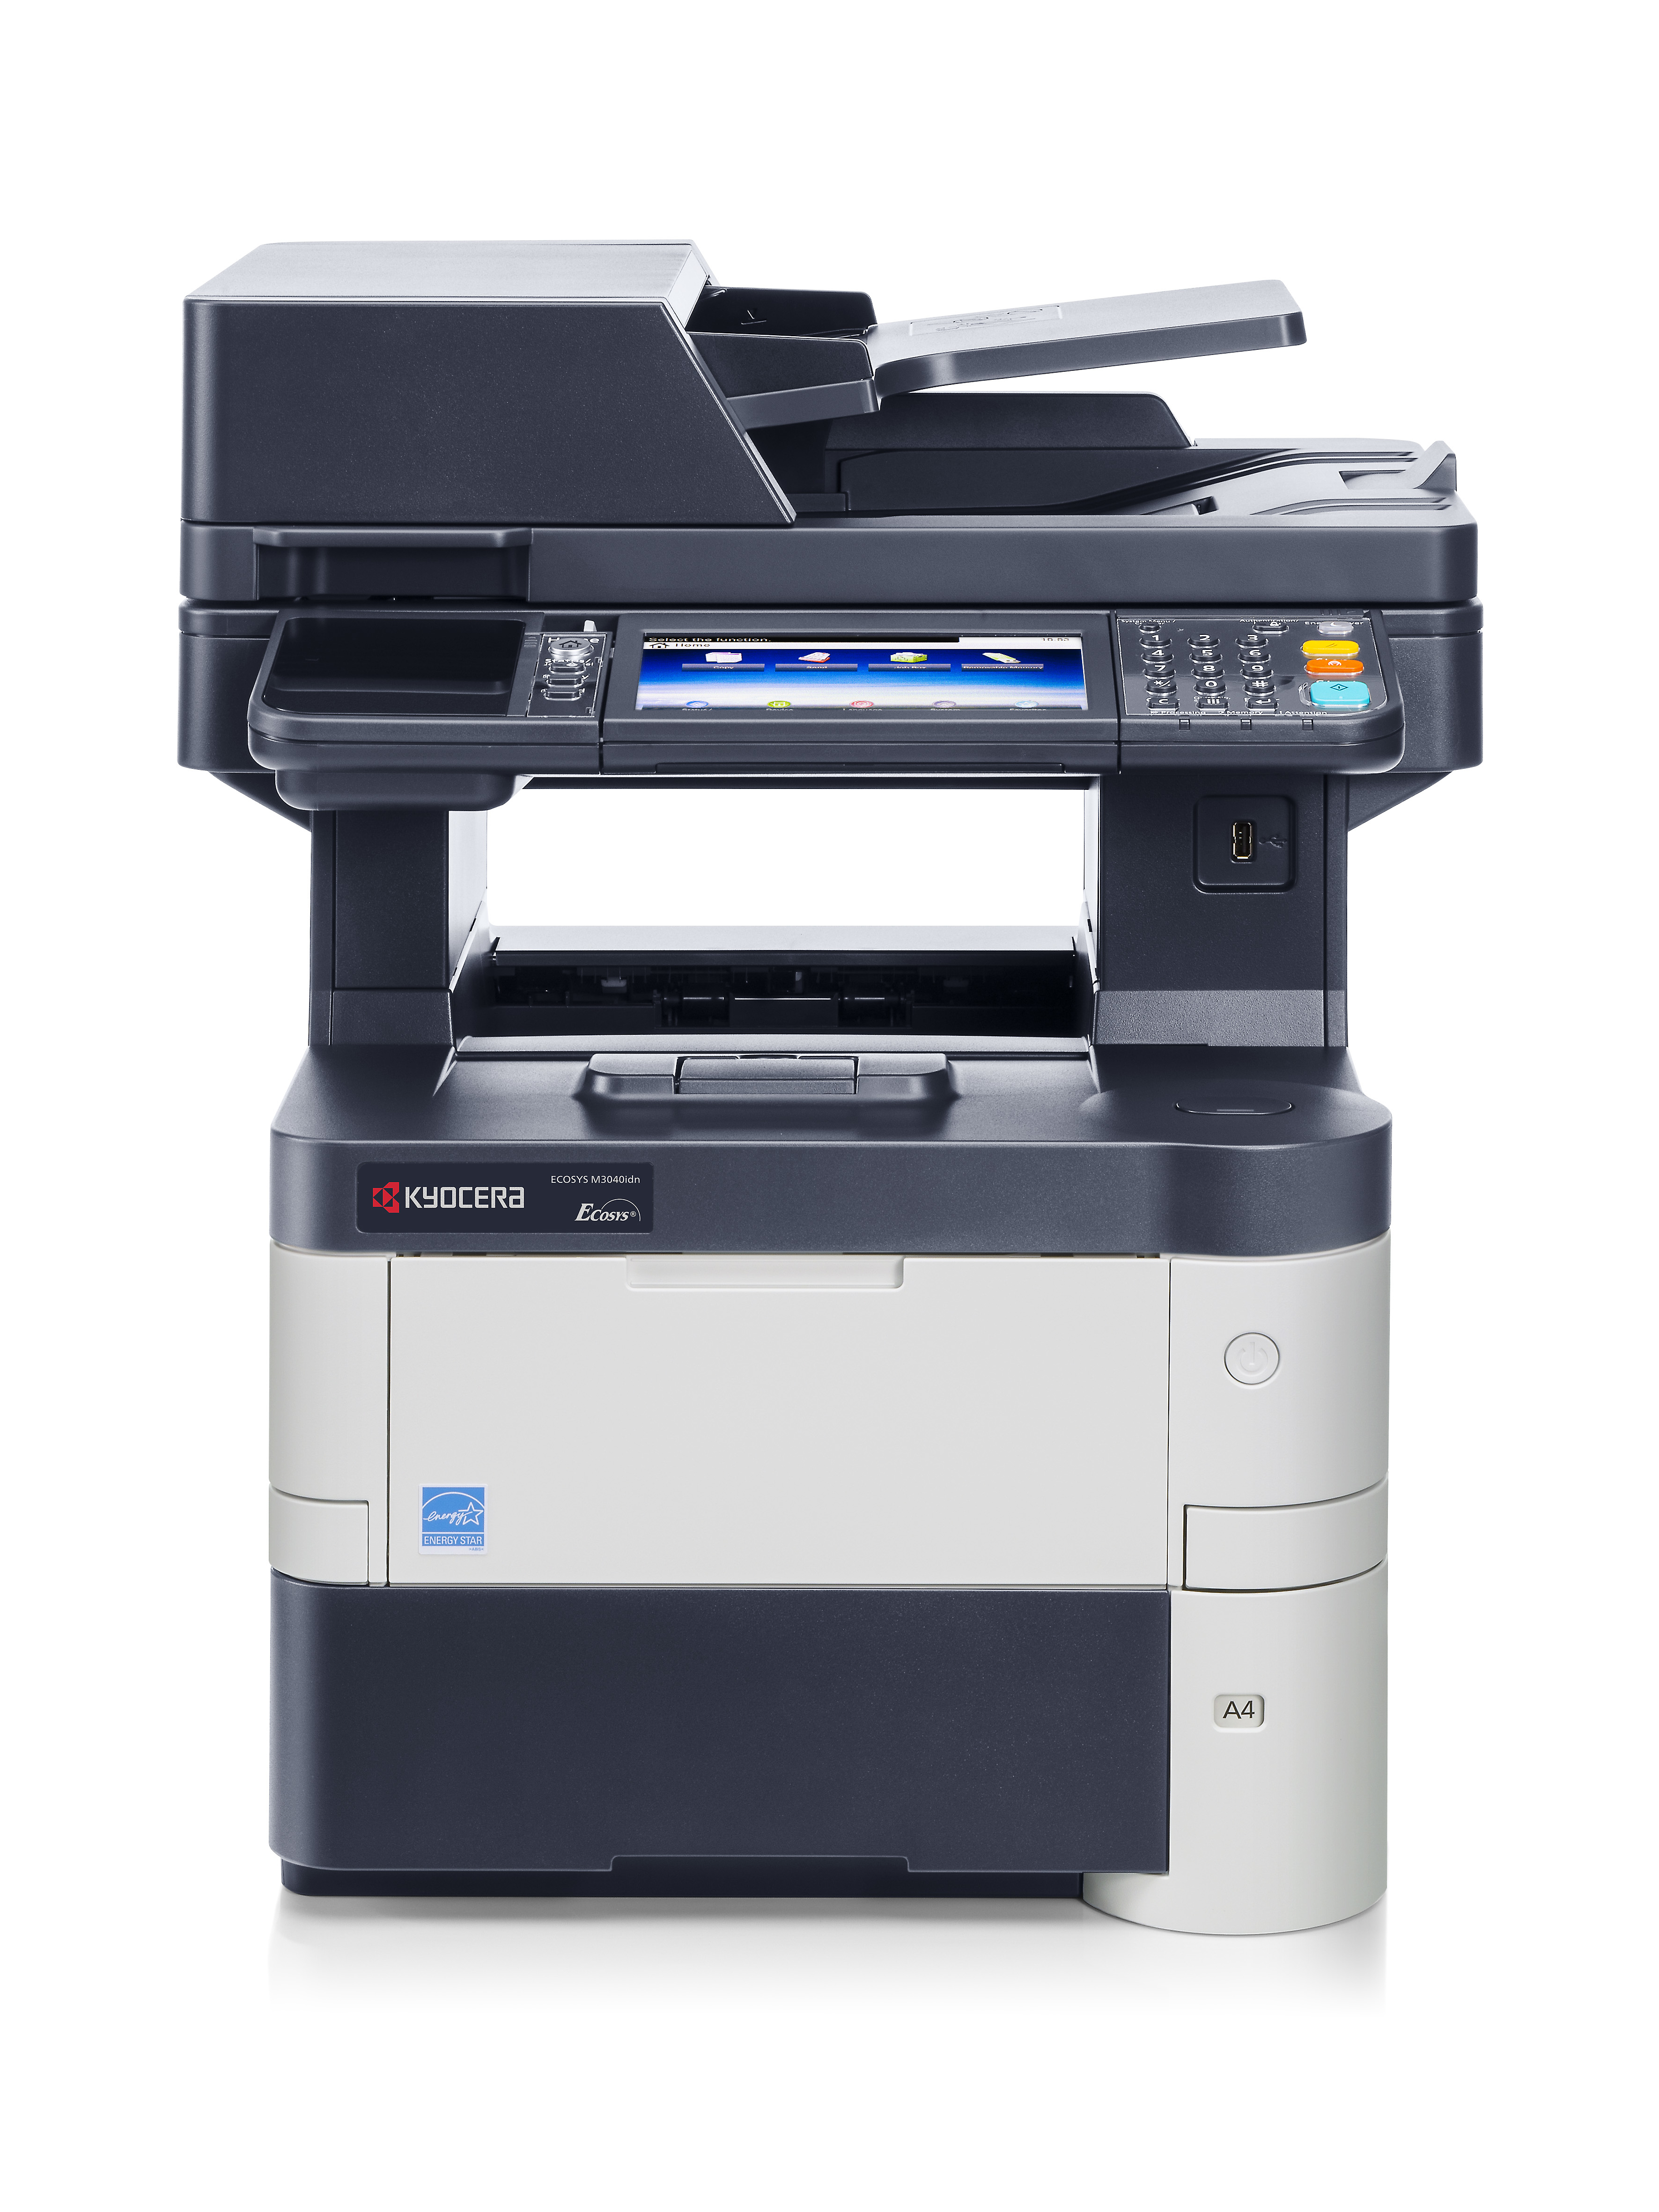 Kyocera ECOSYS M3040idn/KL3 - Multifunktionsdrucker - s/w